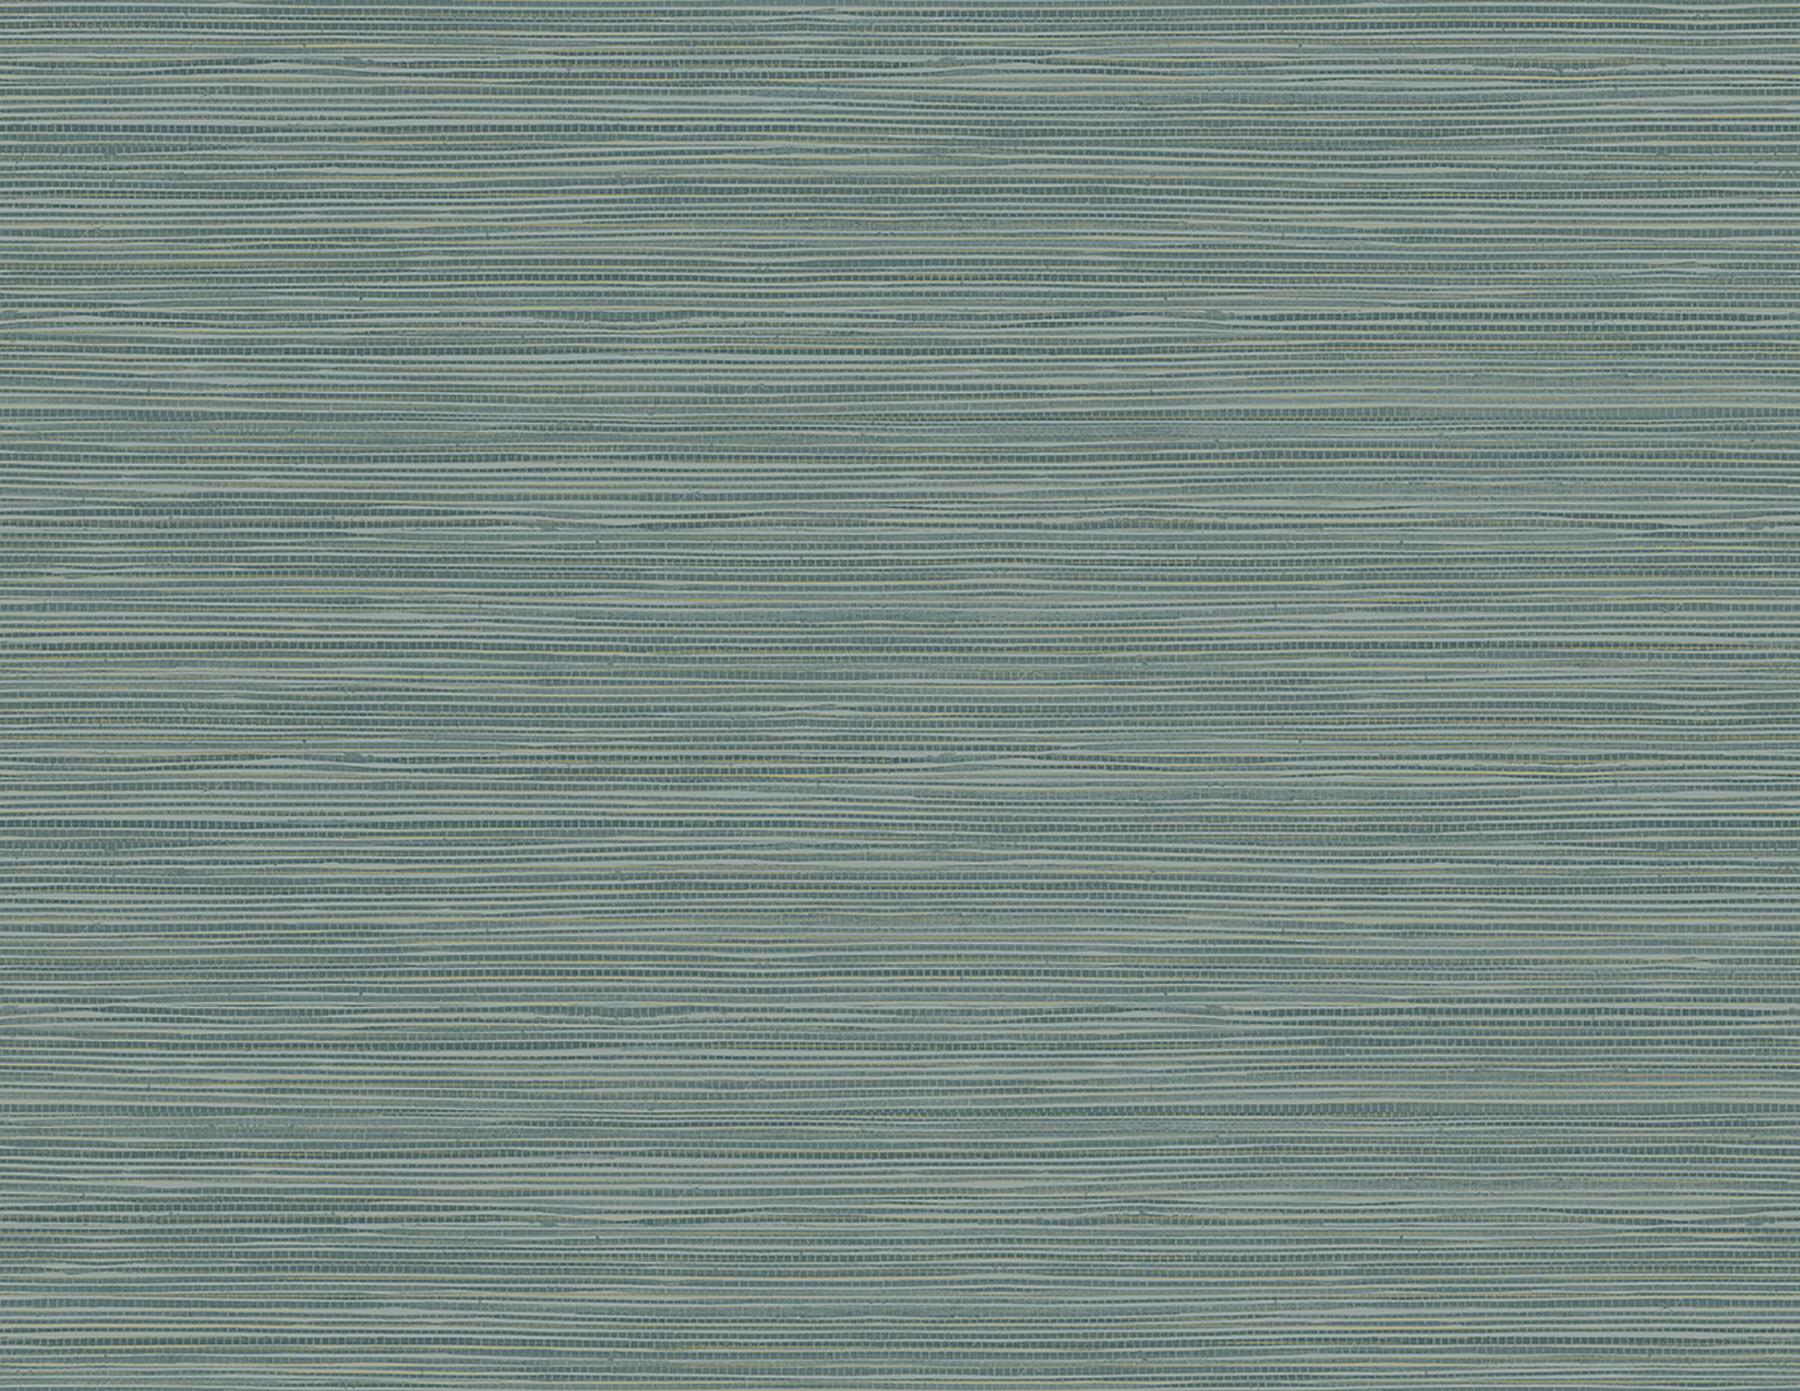 Picture of Bondi Teal Grasscloth Texture Wallpaper